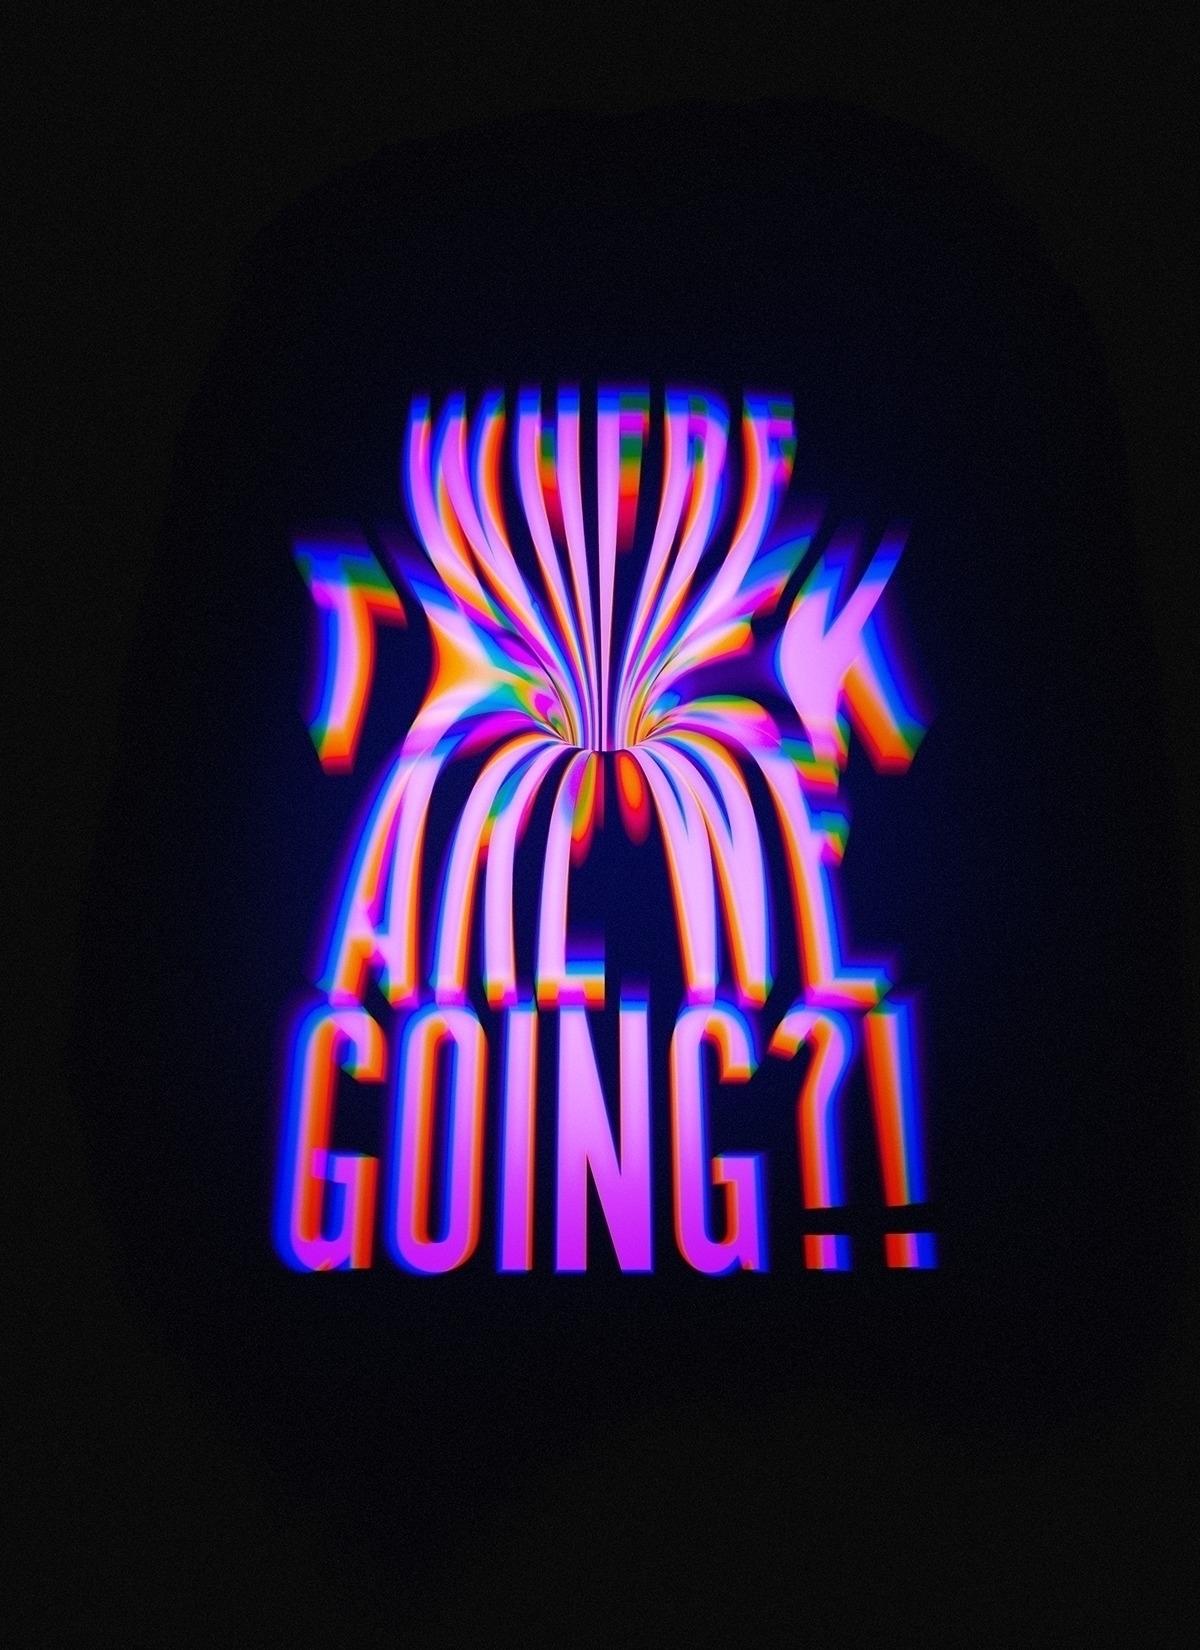 Warp Speed - typography - velvetspectrum | ello